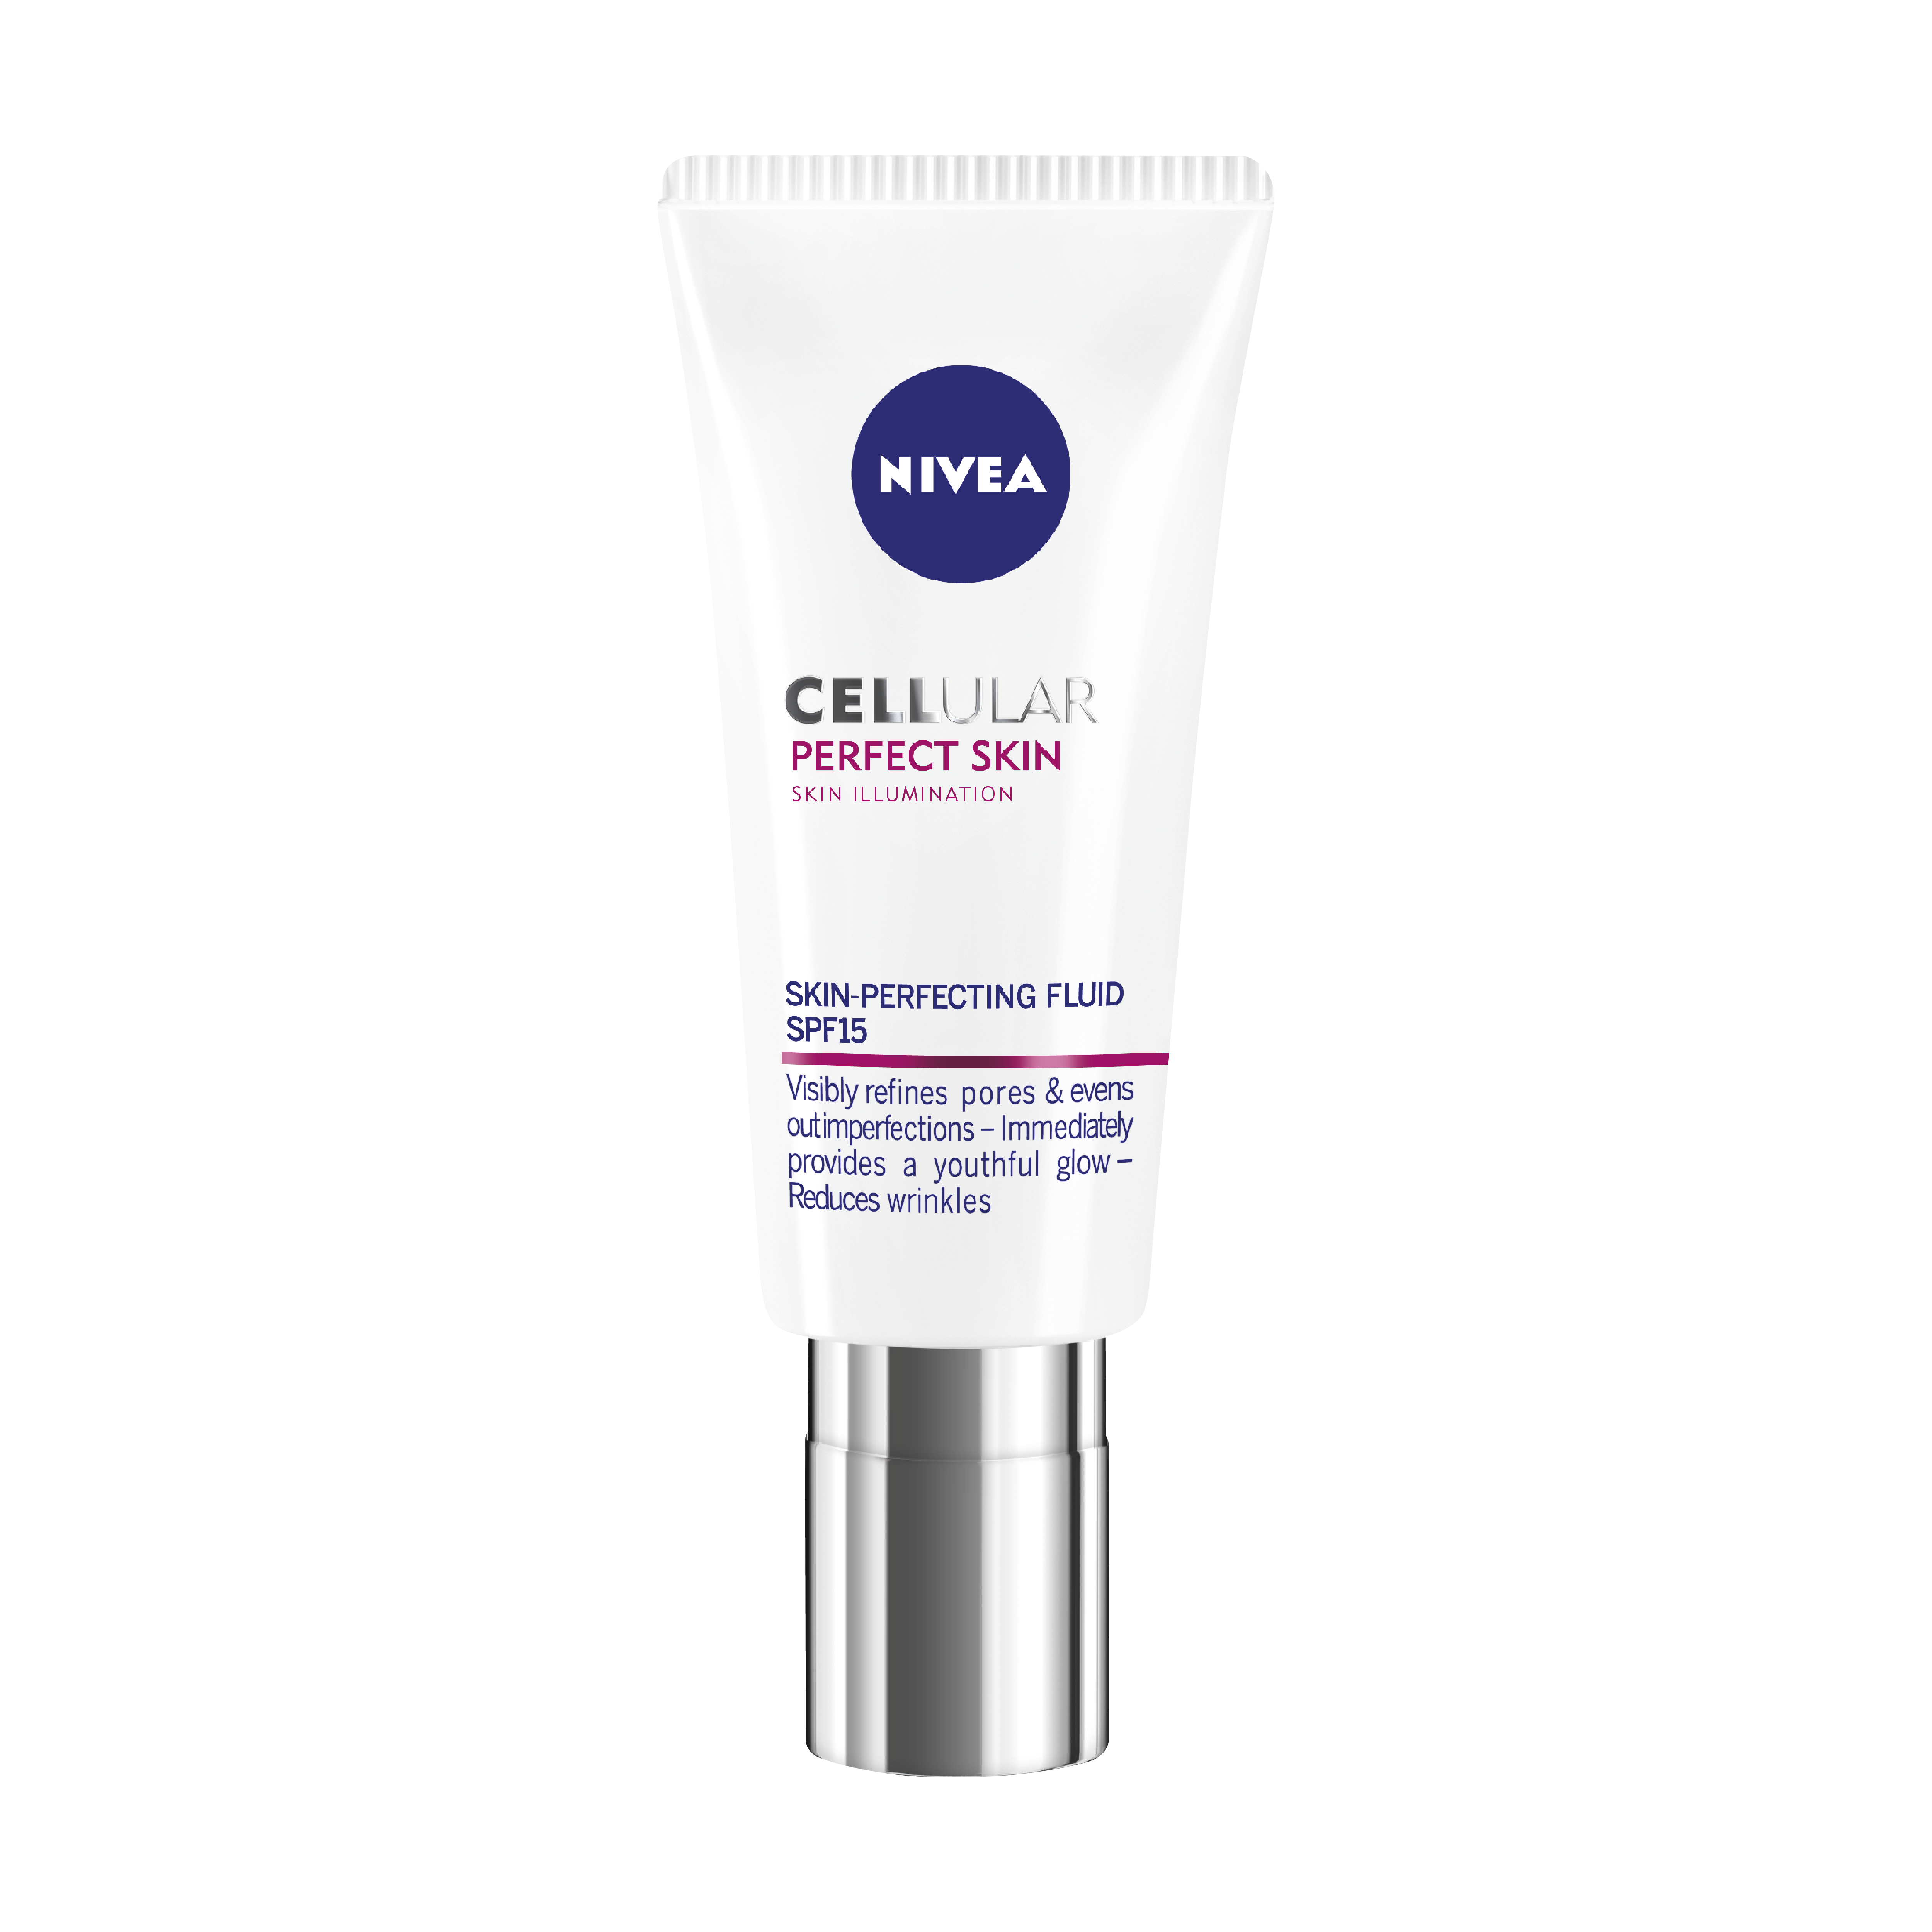 Cellular Perfect Skin Day Cream SPF 15